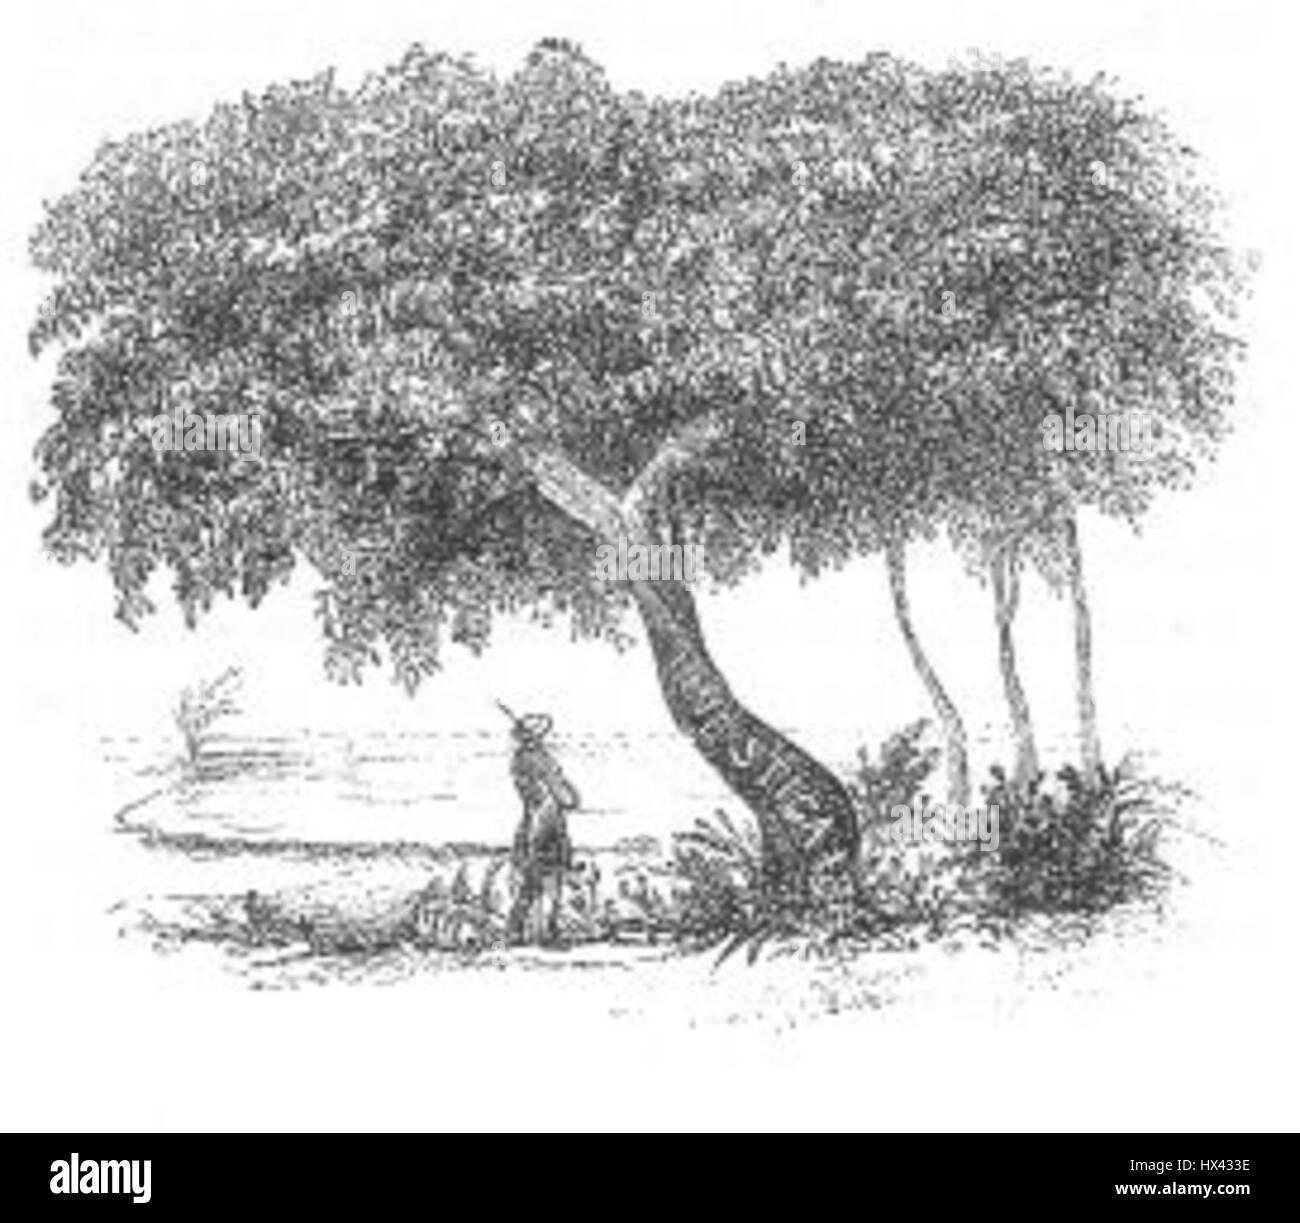 Interesting Tree (Discoveries in Australia) - Stock Image